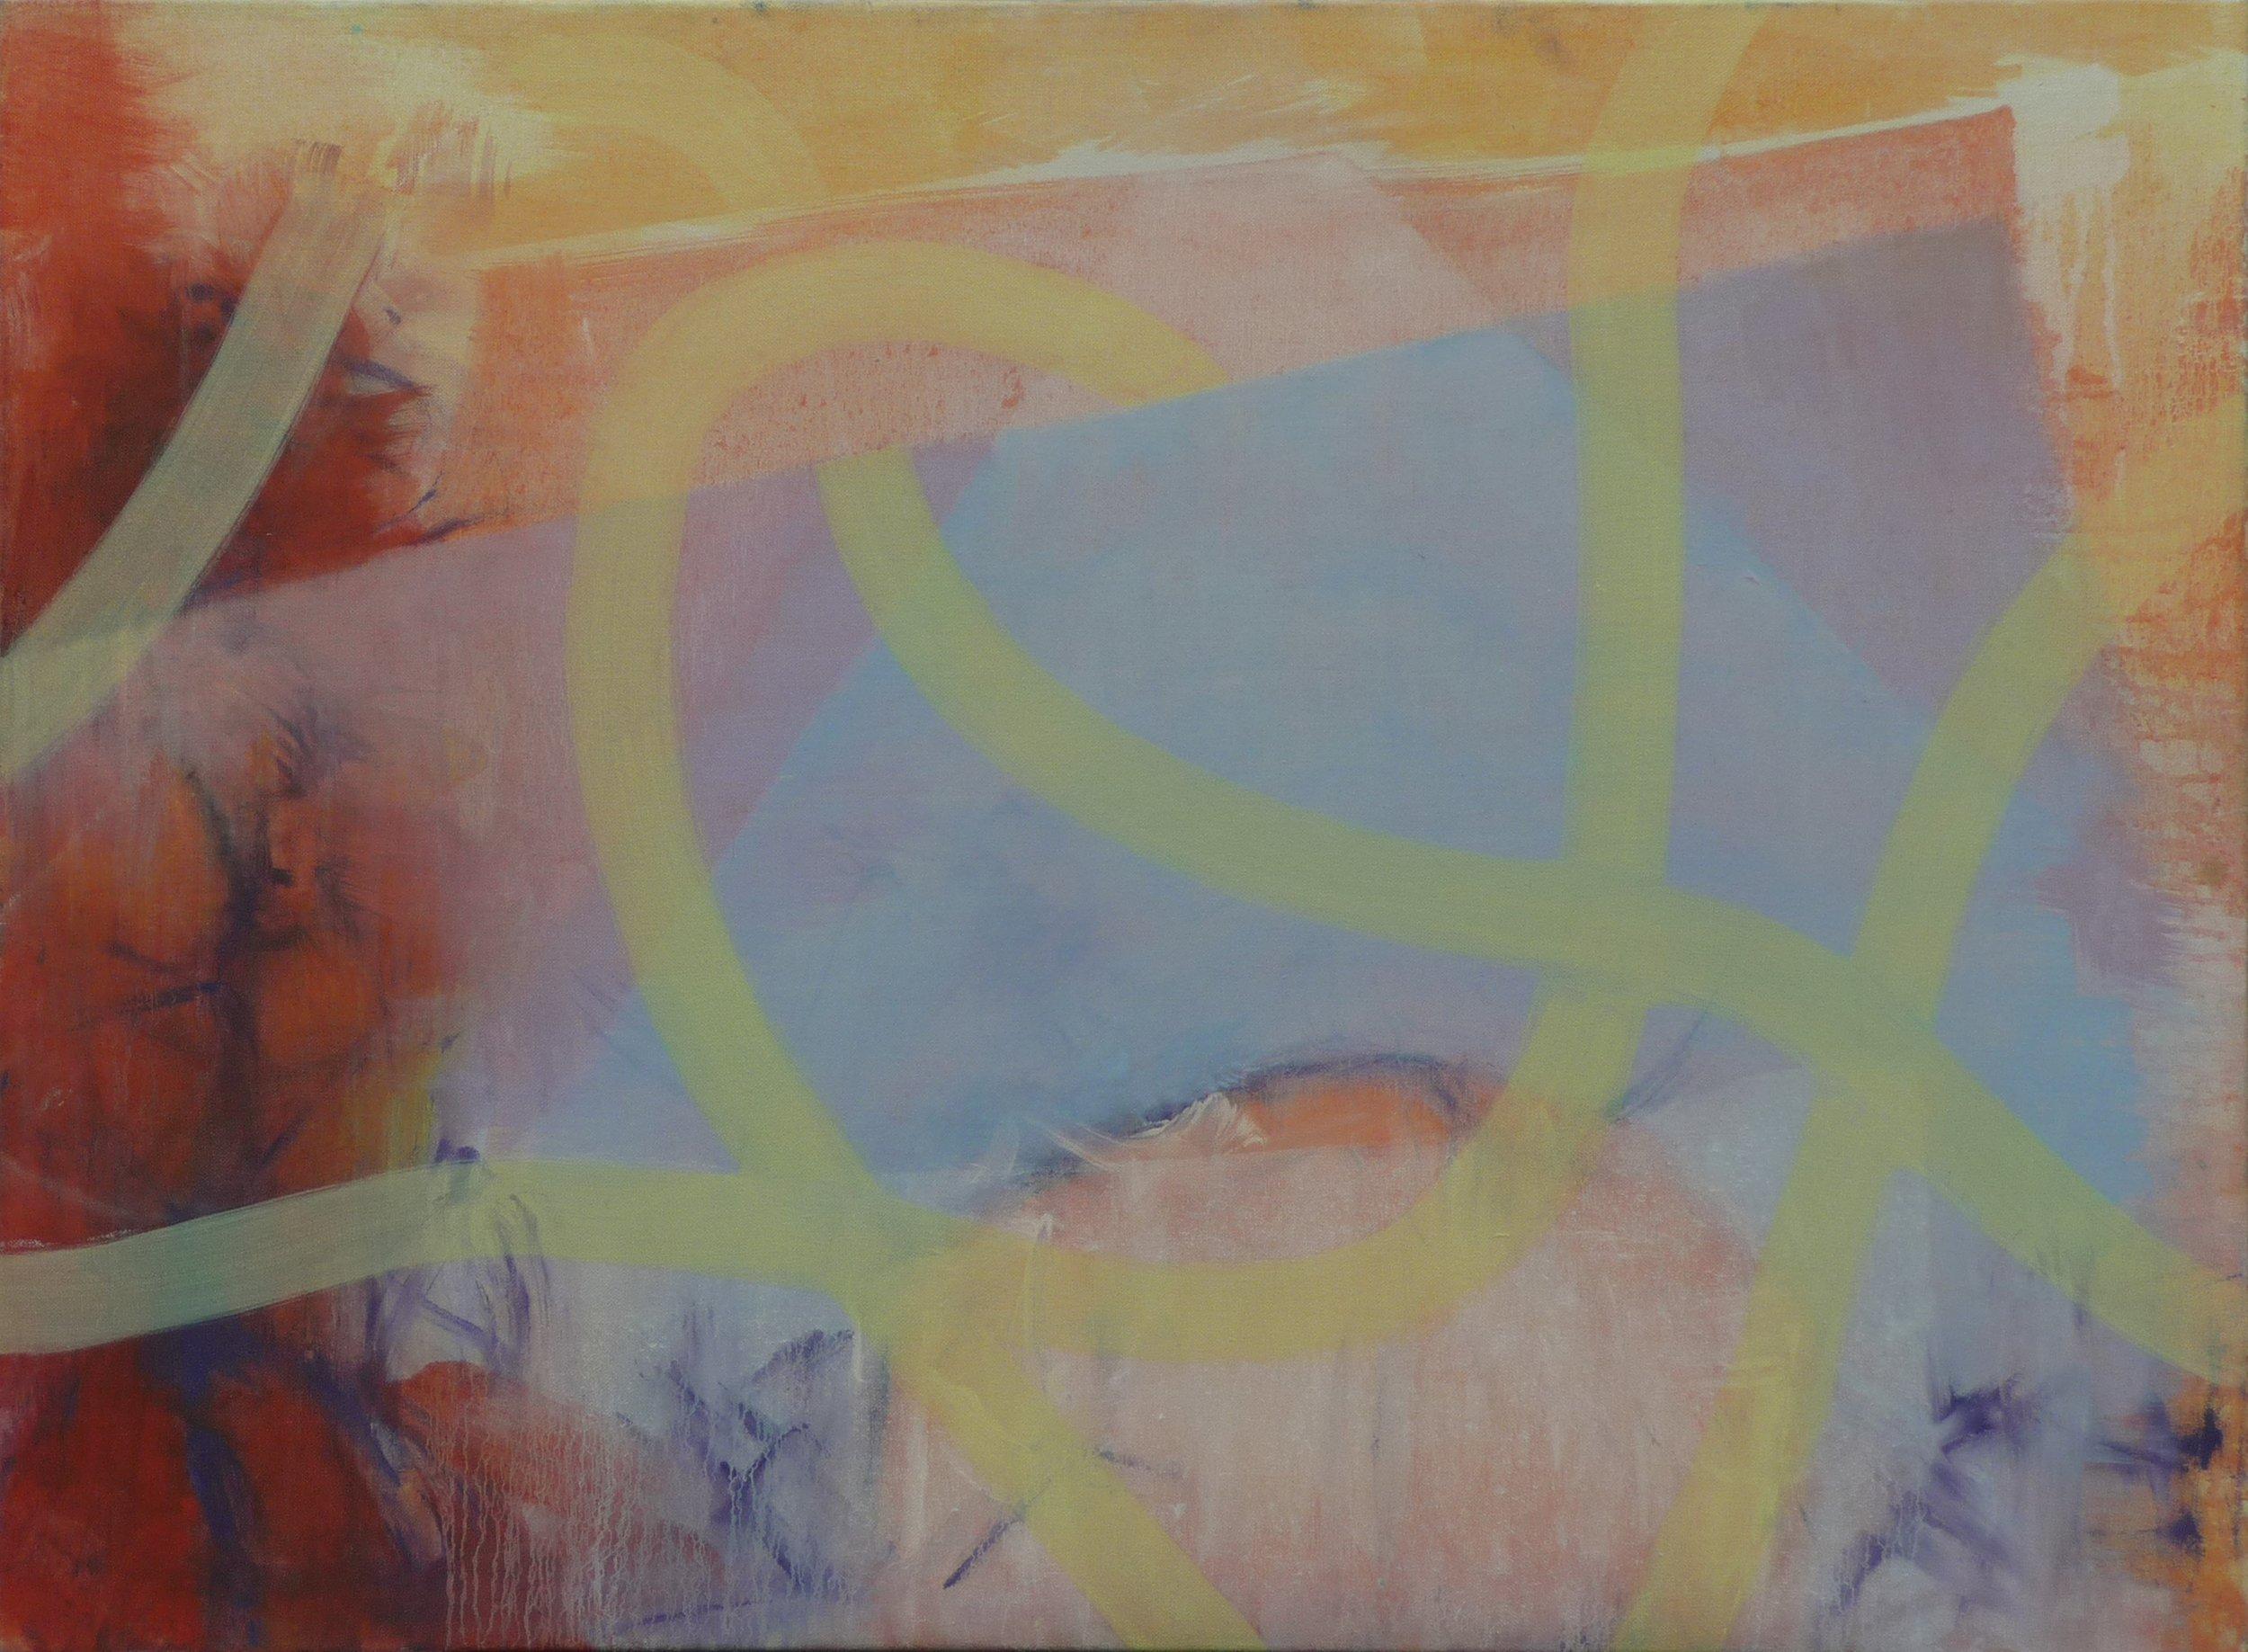 Schemenhaft iii, Oil on canvas, 80 x 110 cm